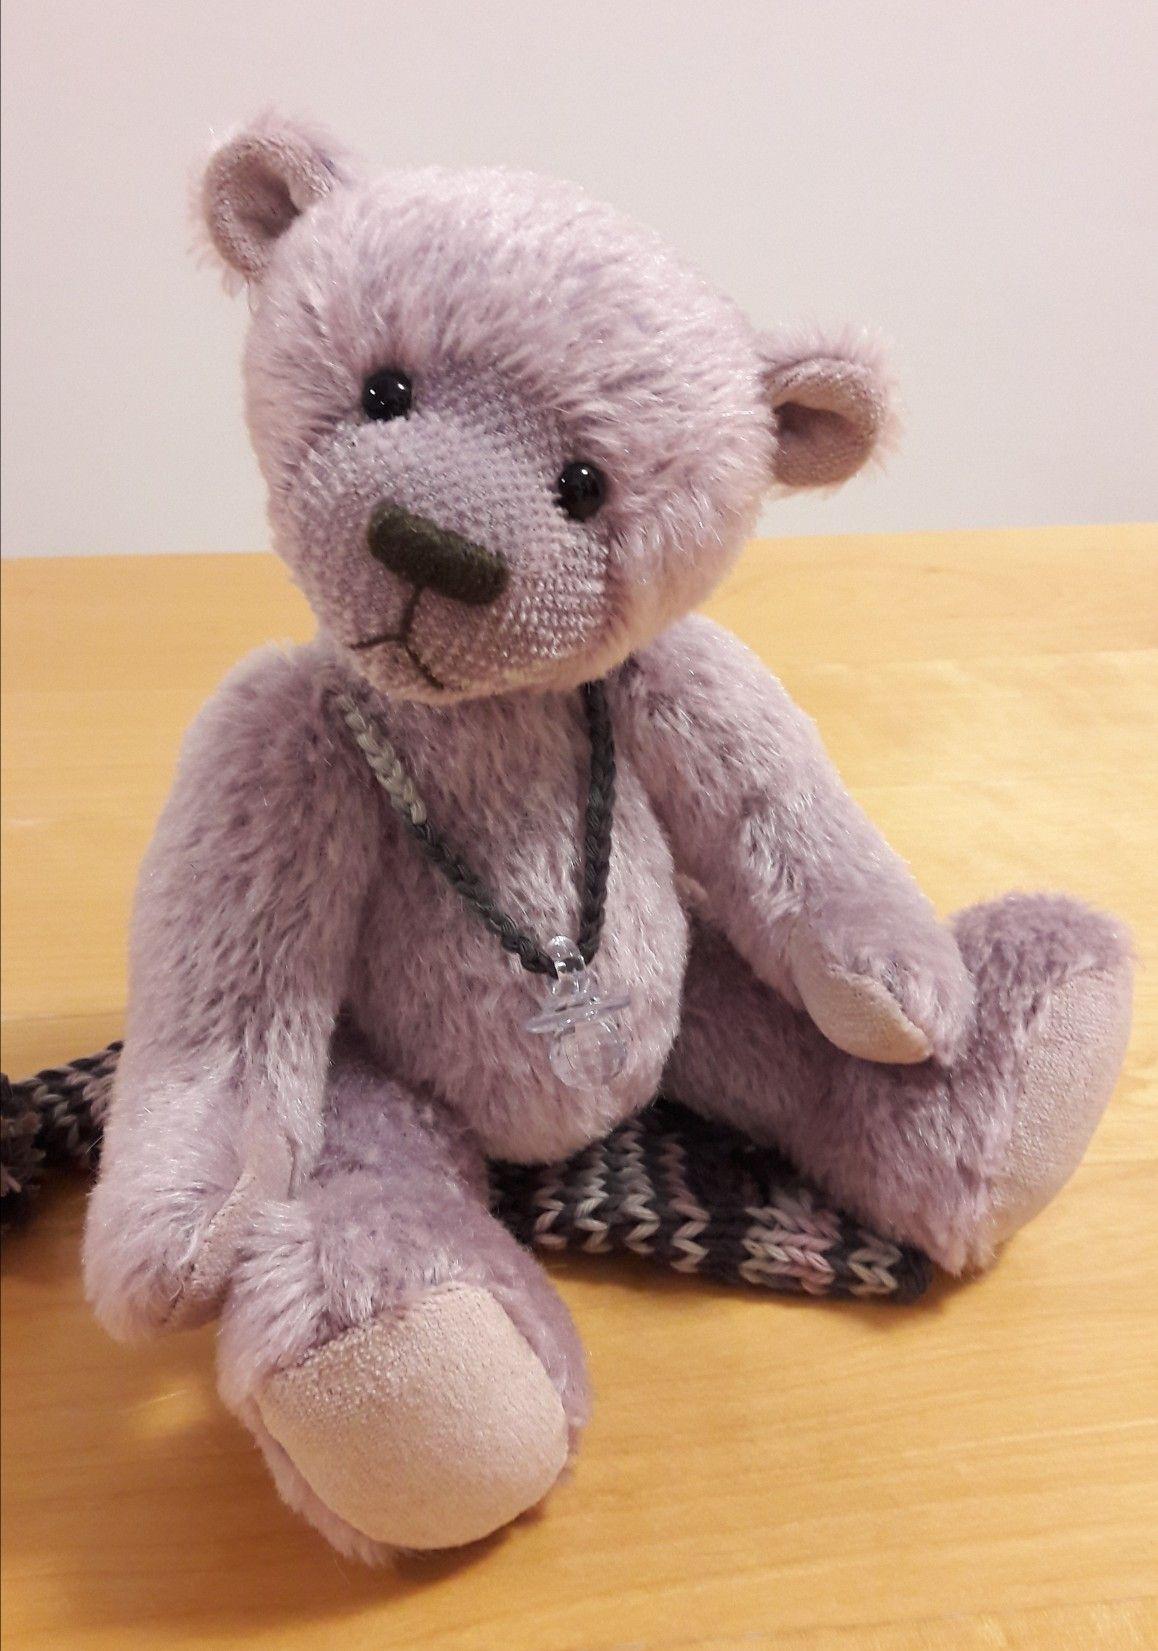 OOAK Teddy Bear mohair cute stuffed toy lilac